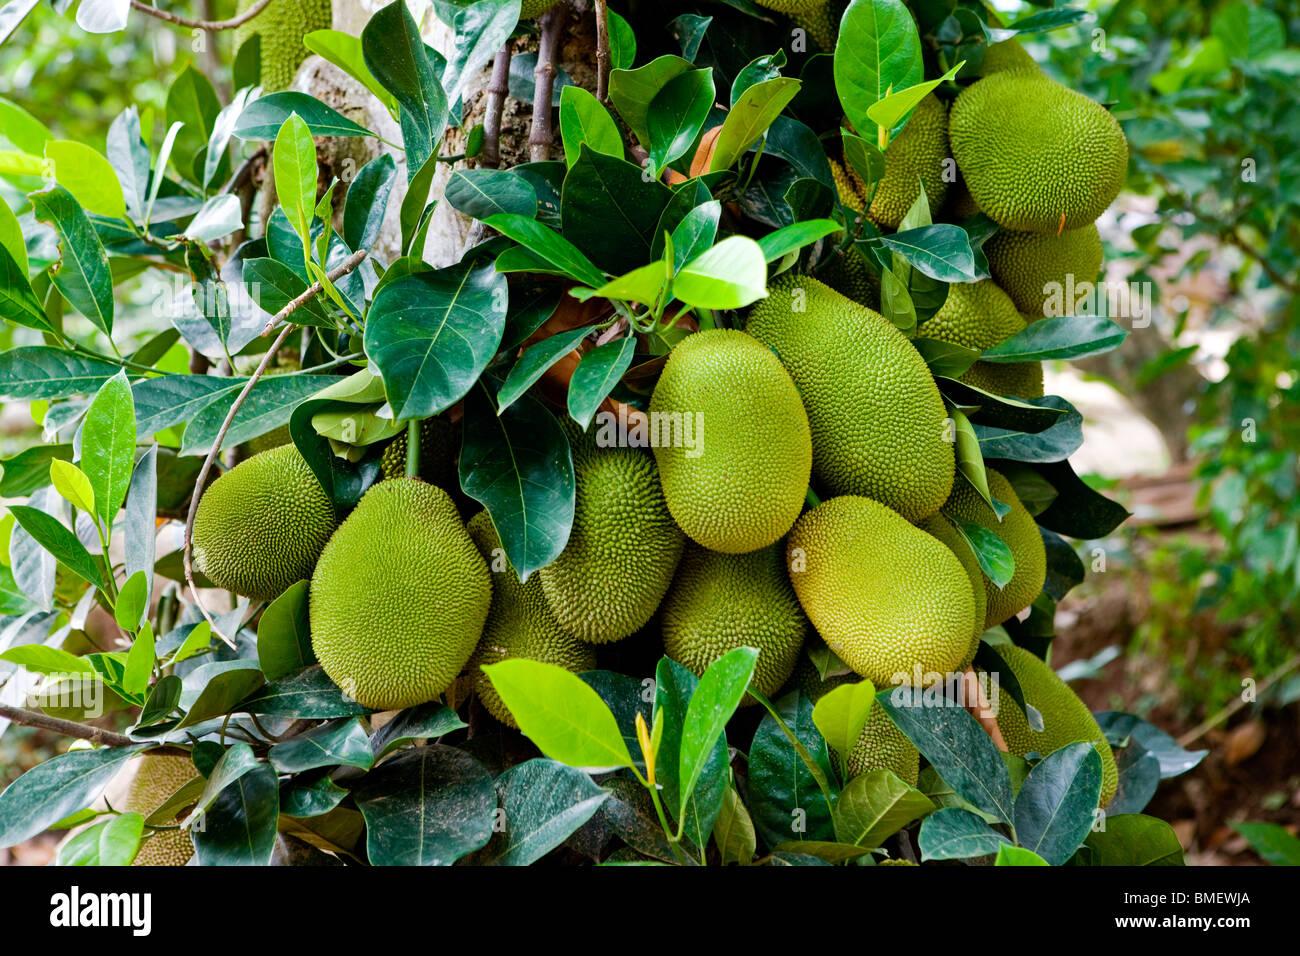 jackfruit tree images.html